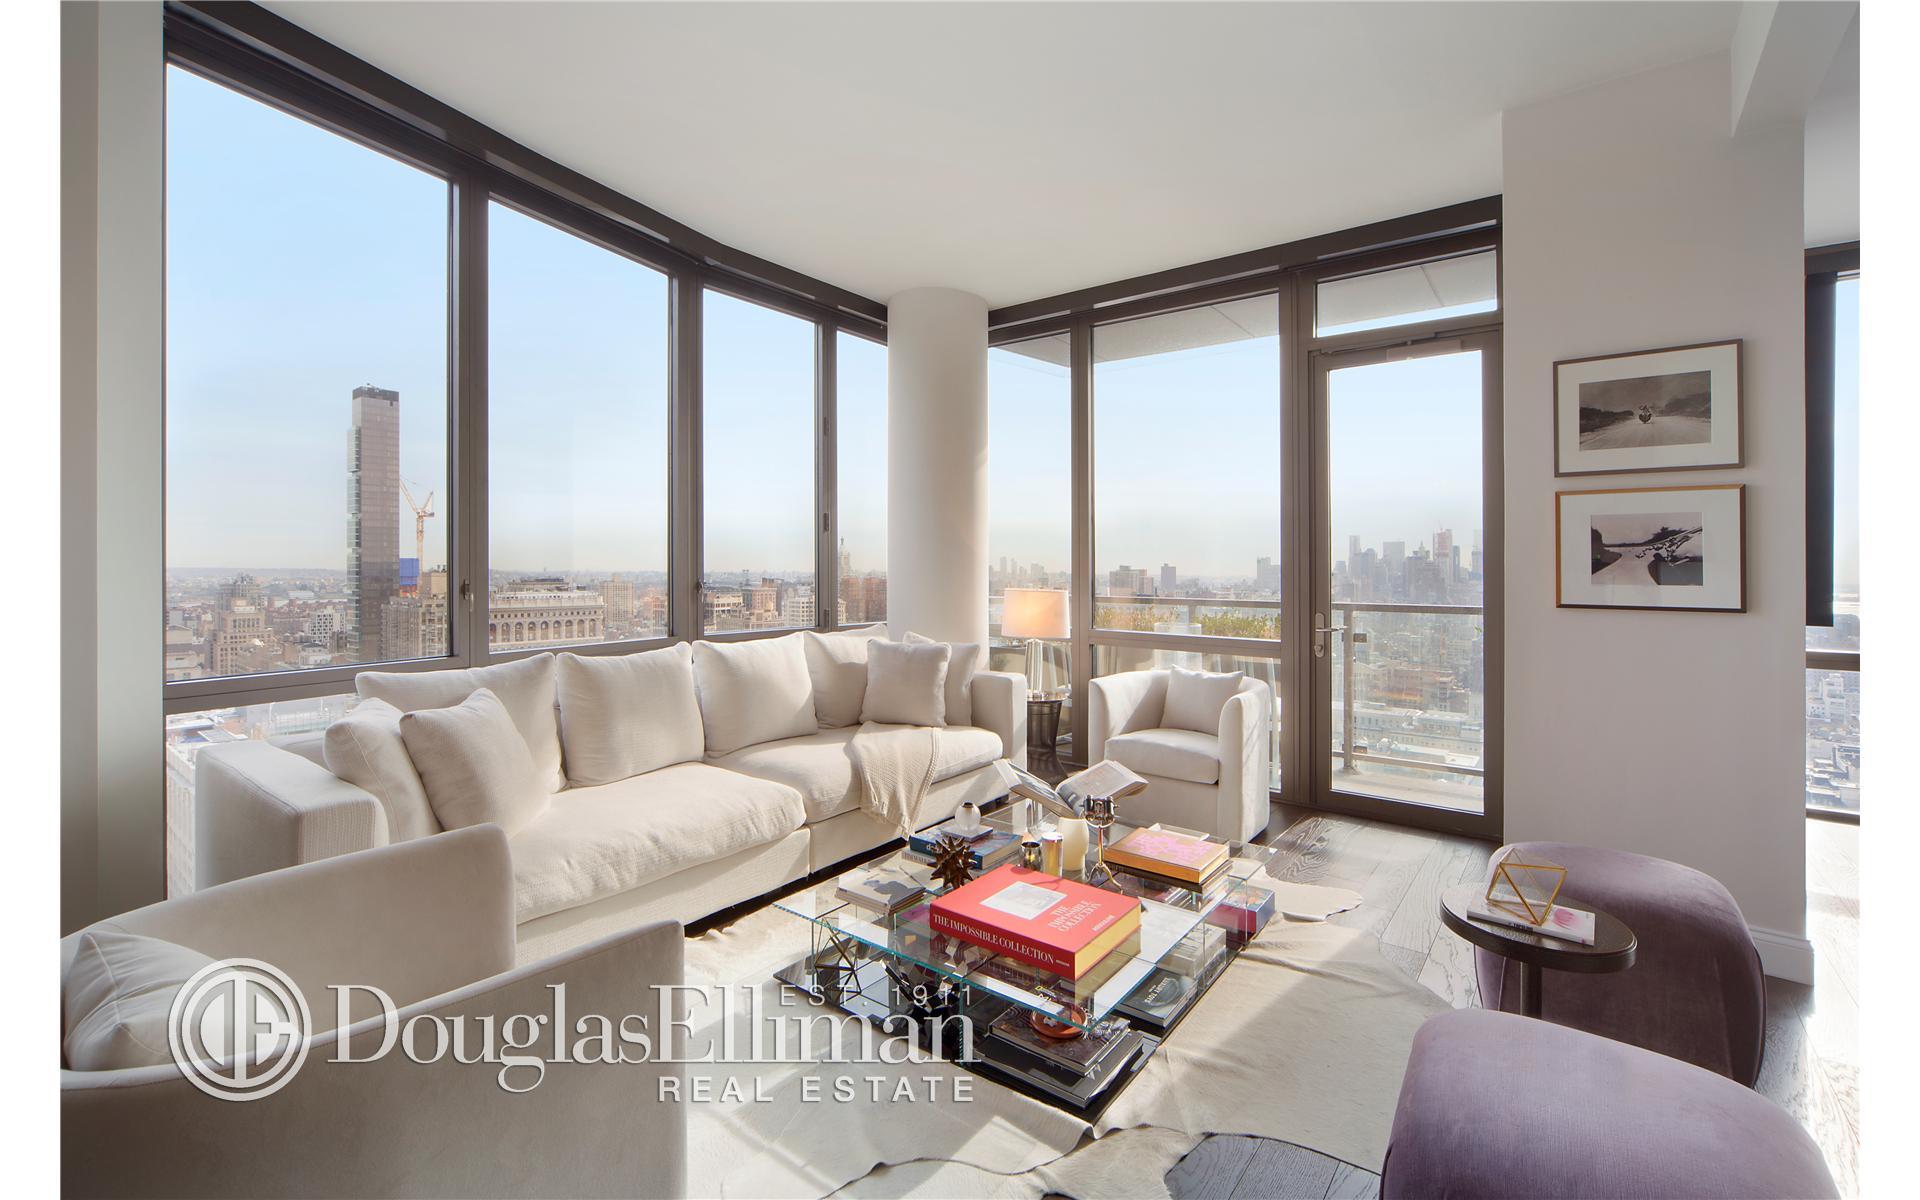 Condominium for Sale at Chelsea Stratus, Chelsea Stratus, 101 West 24th Street New York, New York 10011 United States